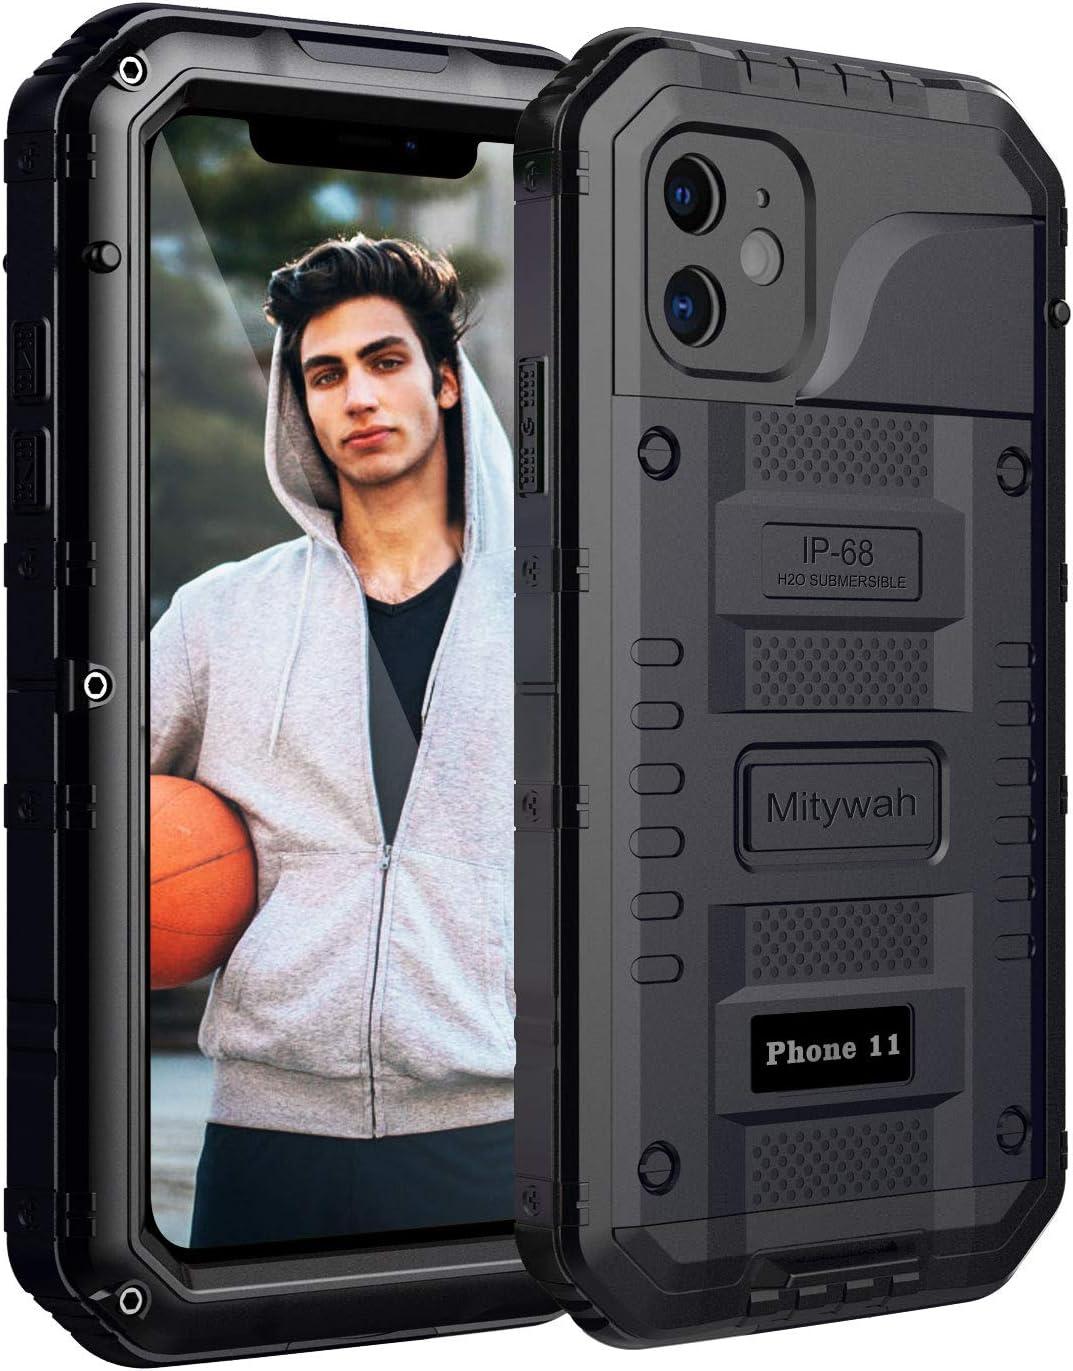 Mitywah Waterproof Case for iPhone 11, Heavy Duty Durable Metal Full Body Protective Case Built-in Screen Protection Waterproof Shockproof Dustproof Rugged Military Grade Defender, Black